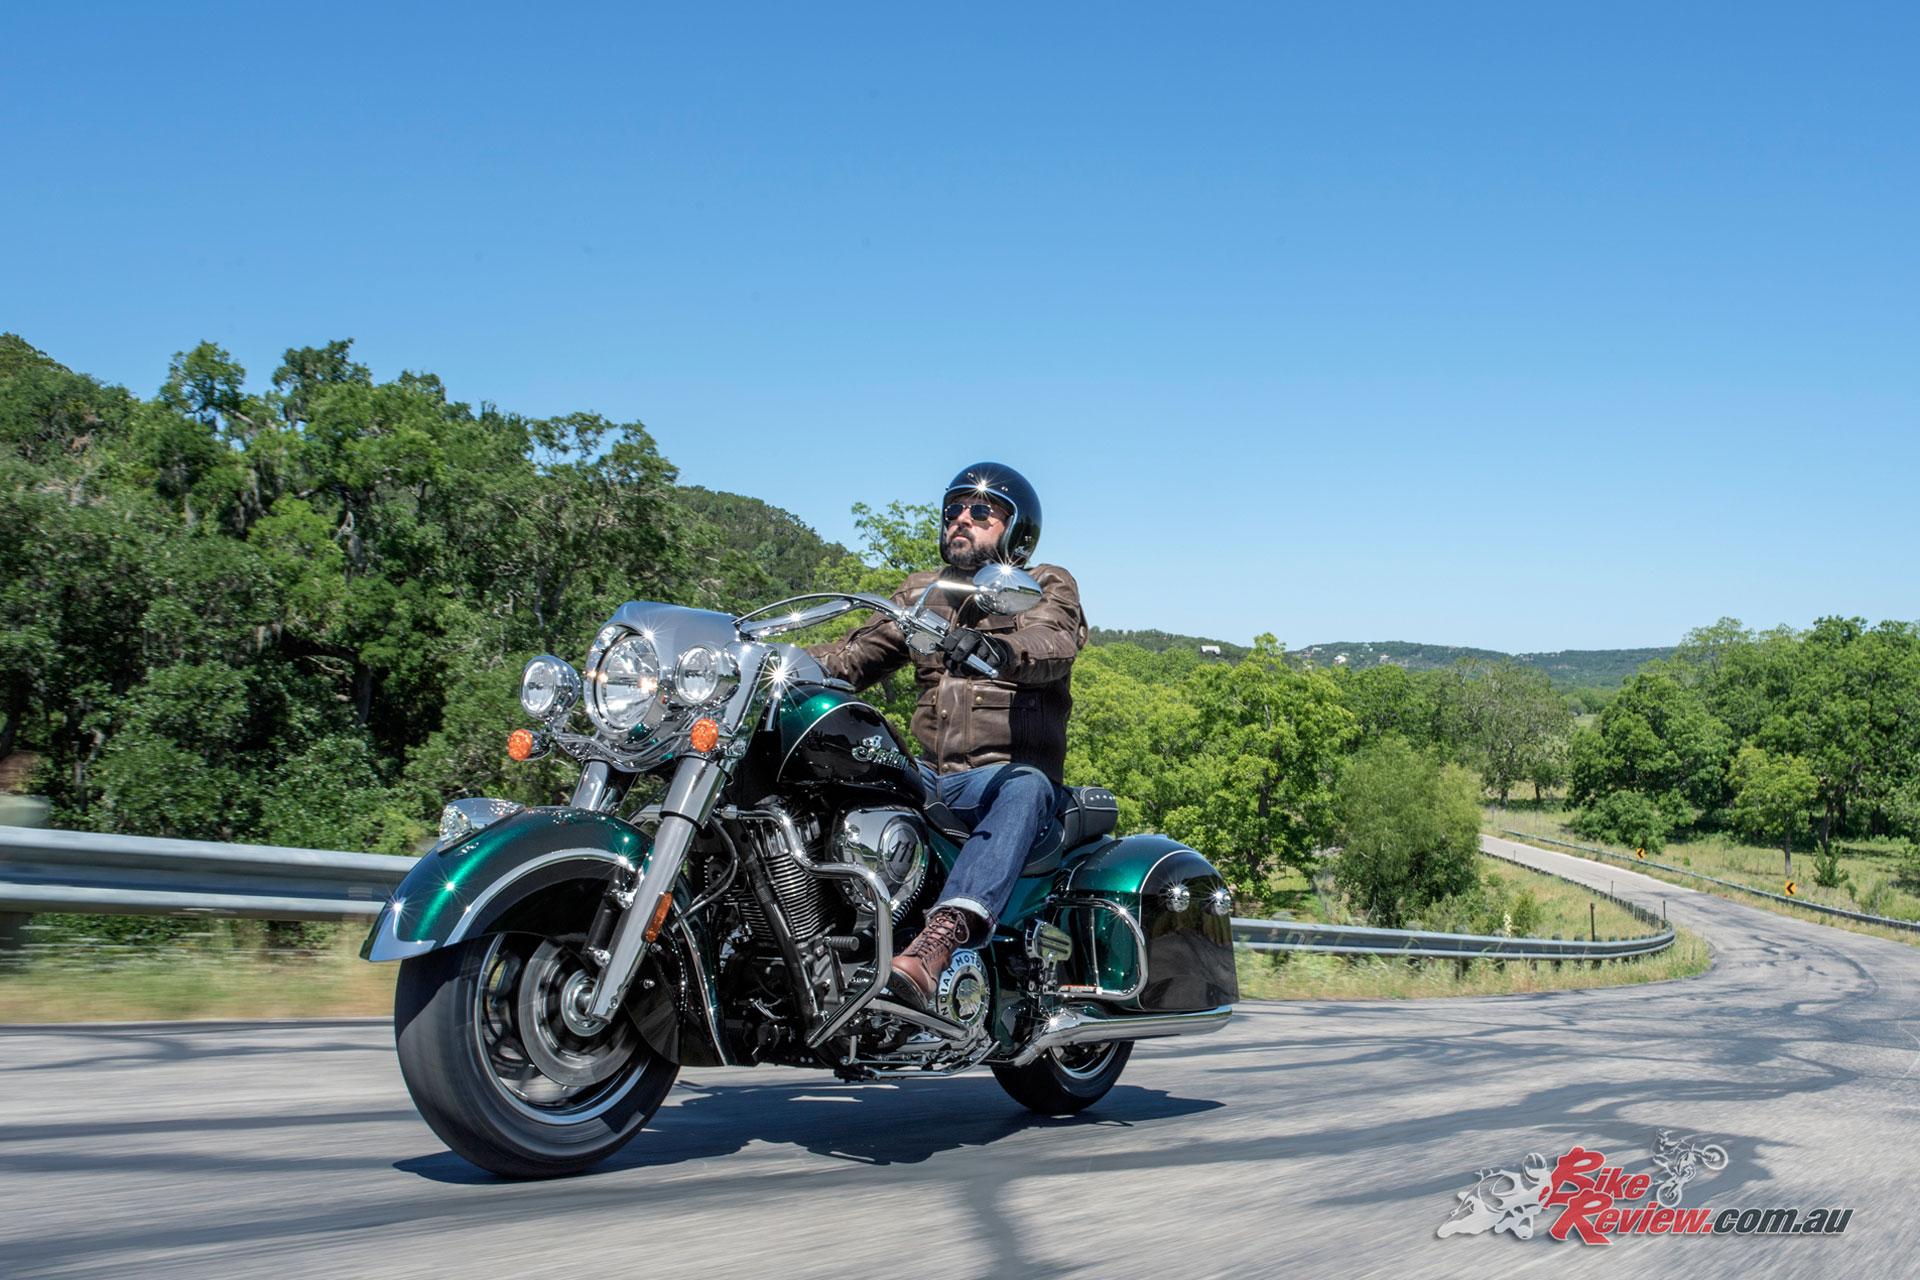 2018-Indian-Springfield-metallic-jade-thunder-black-0685